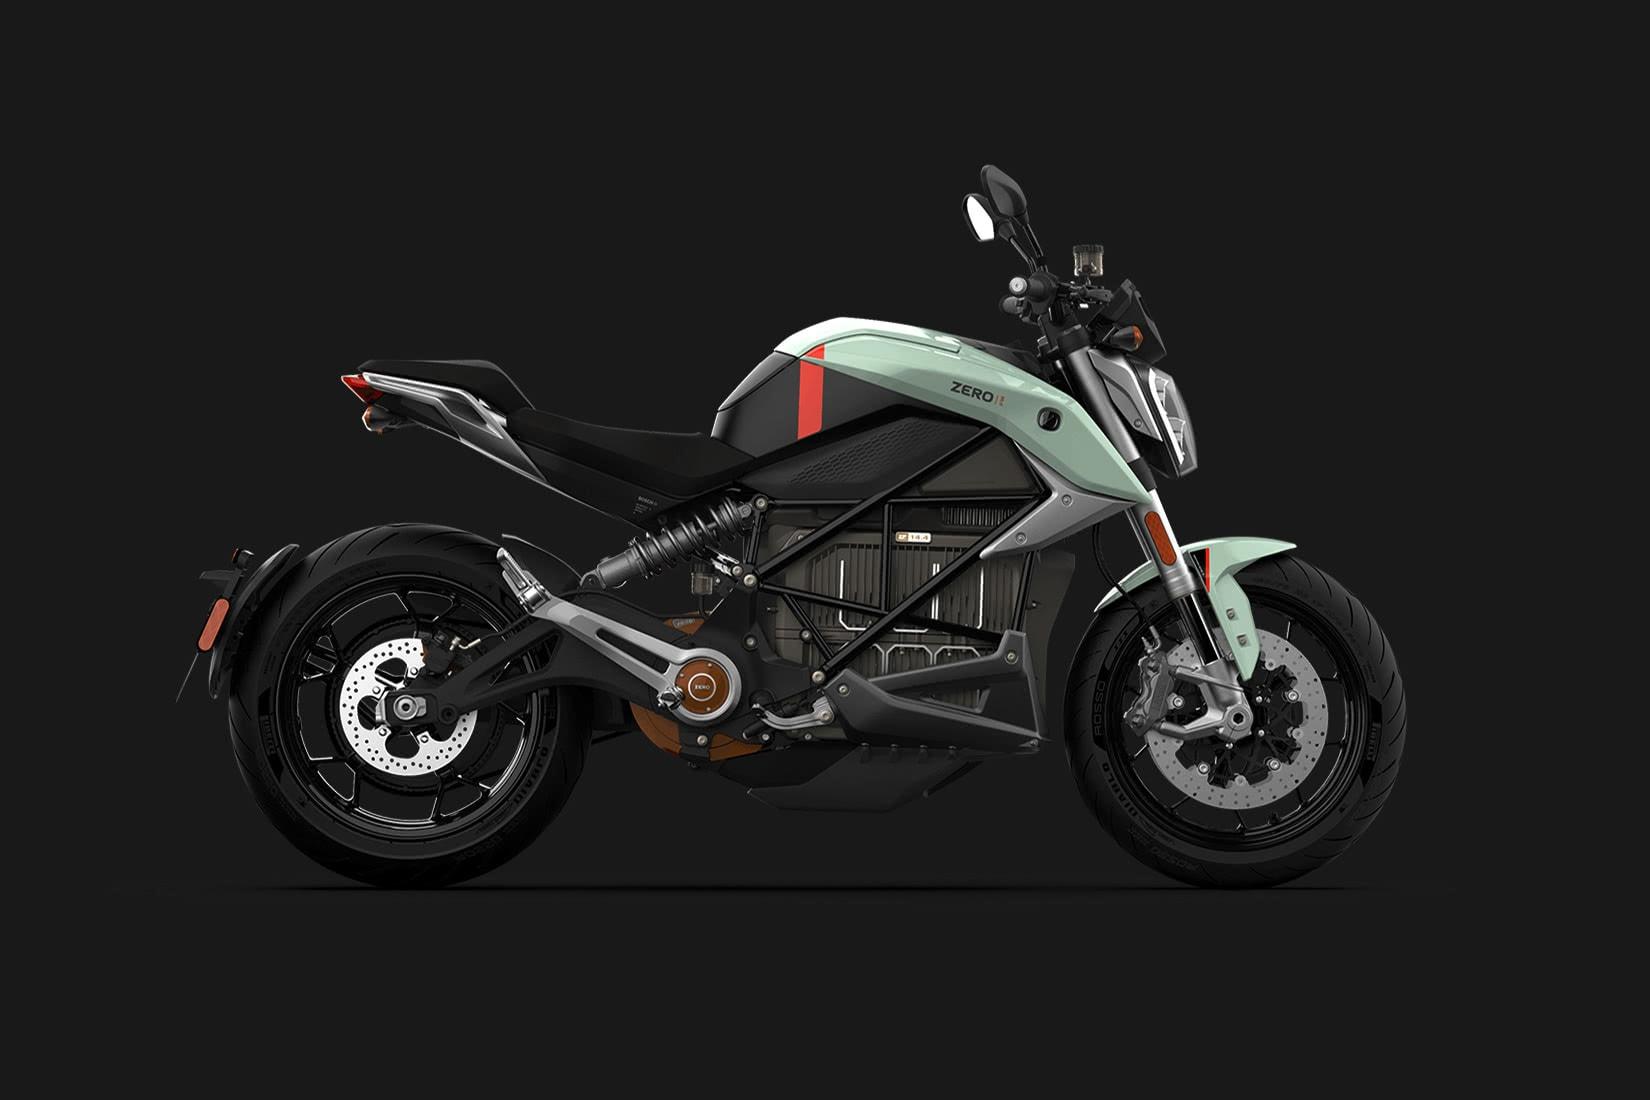 best electric motorcycles 2021 luxury Zero SR/F - Luxe Digital